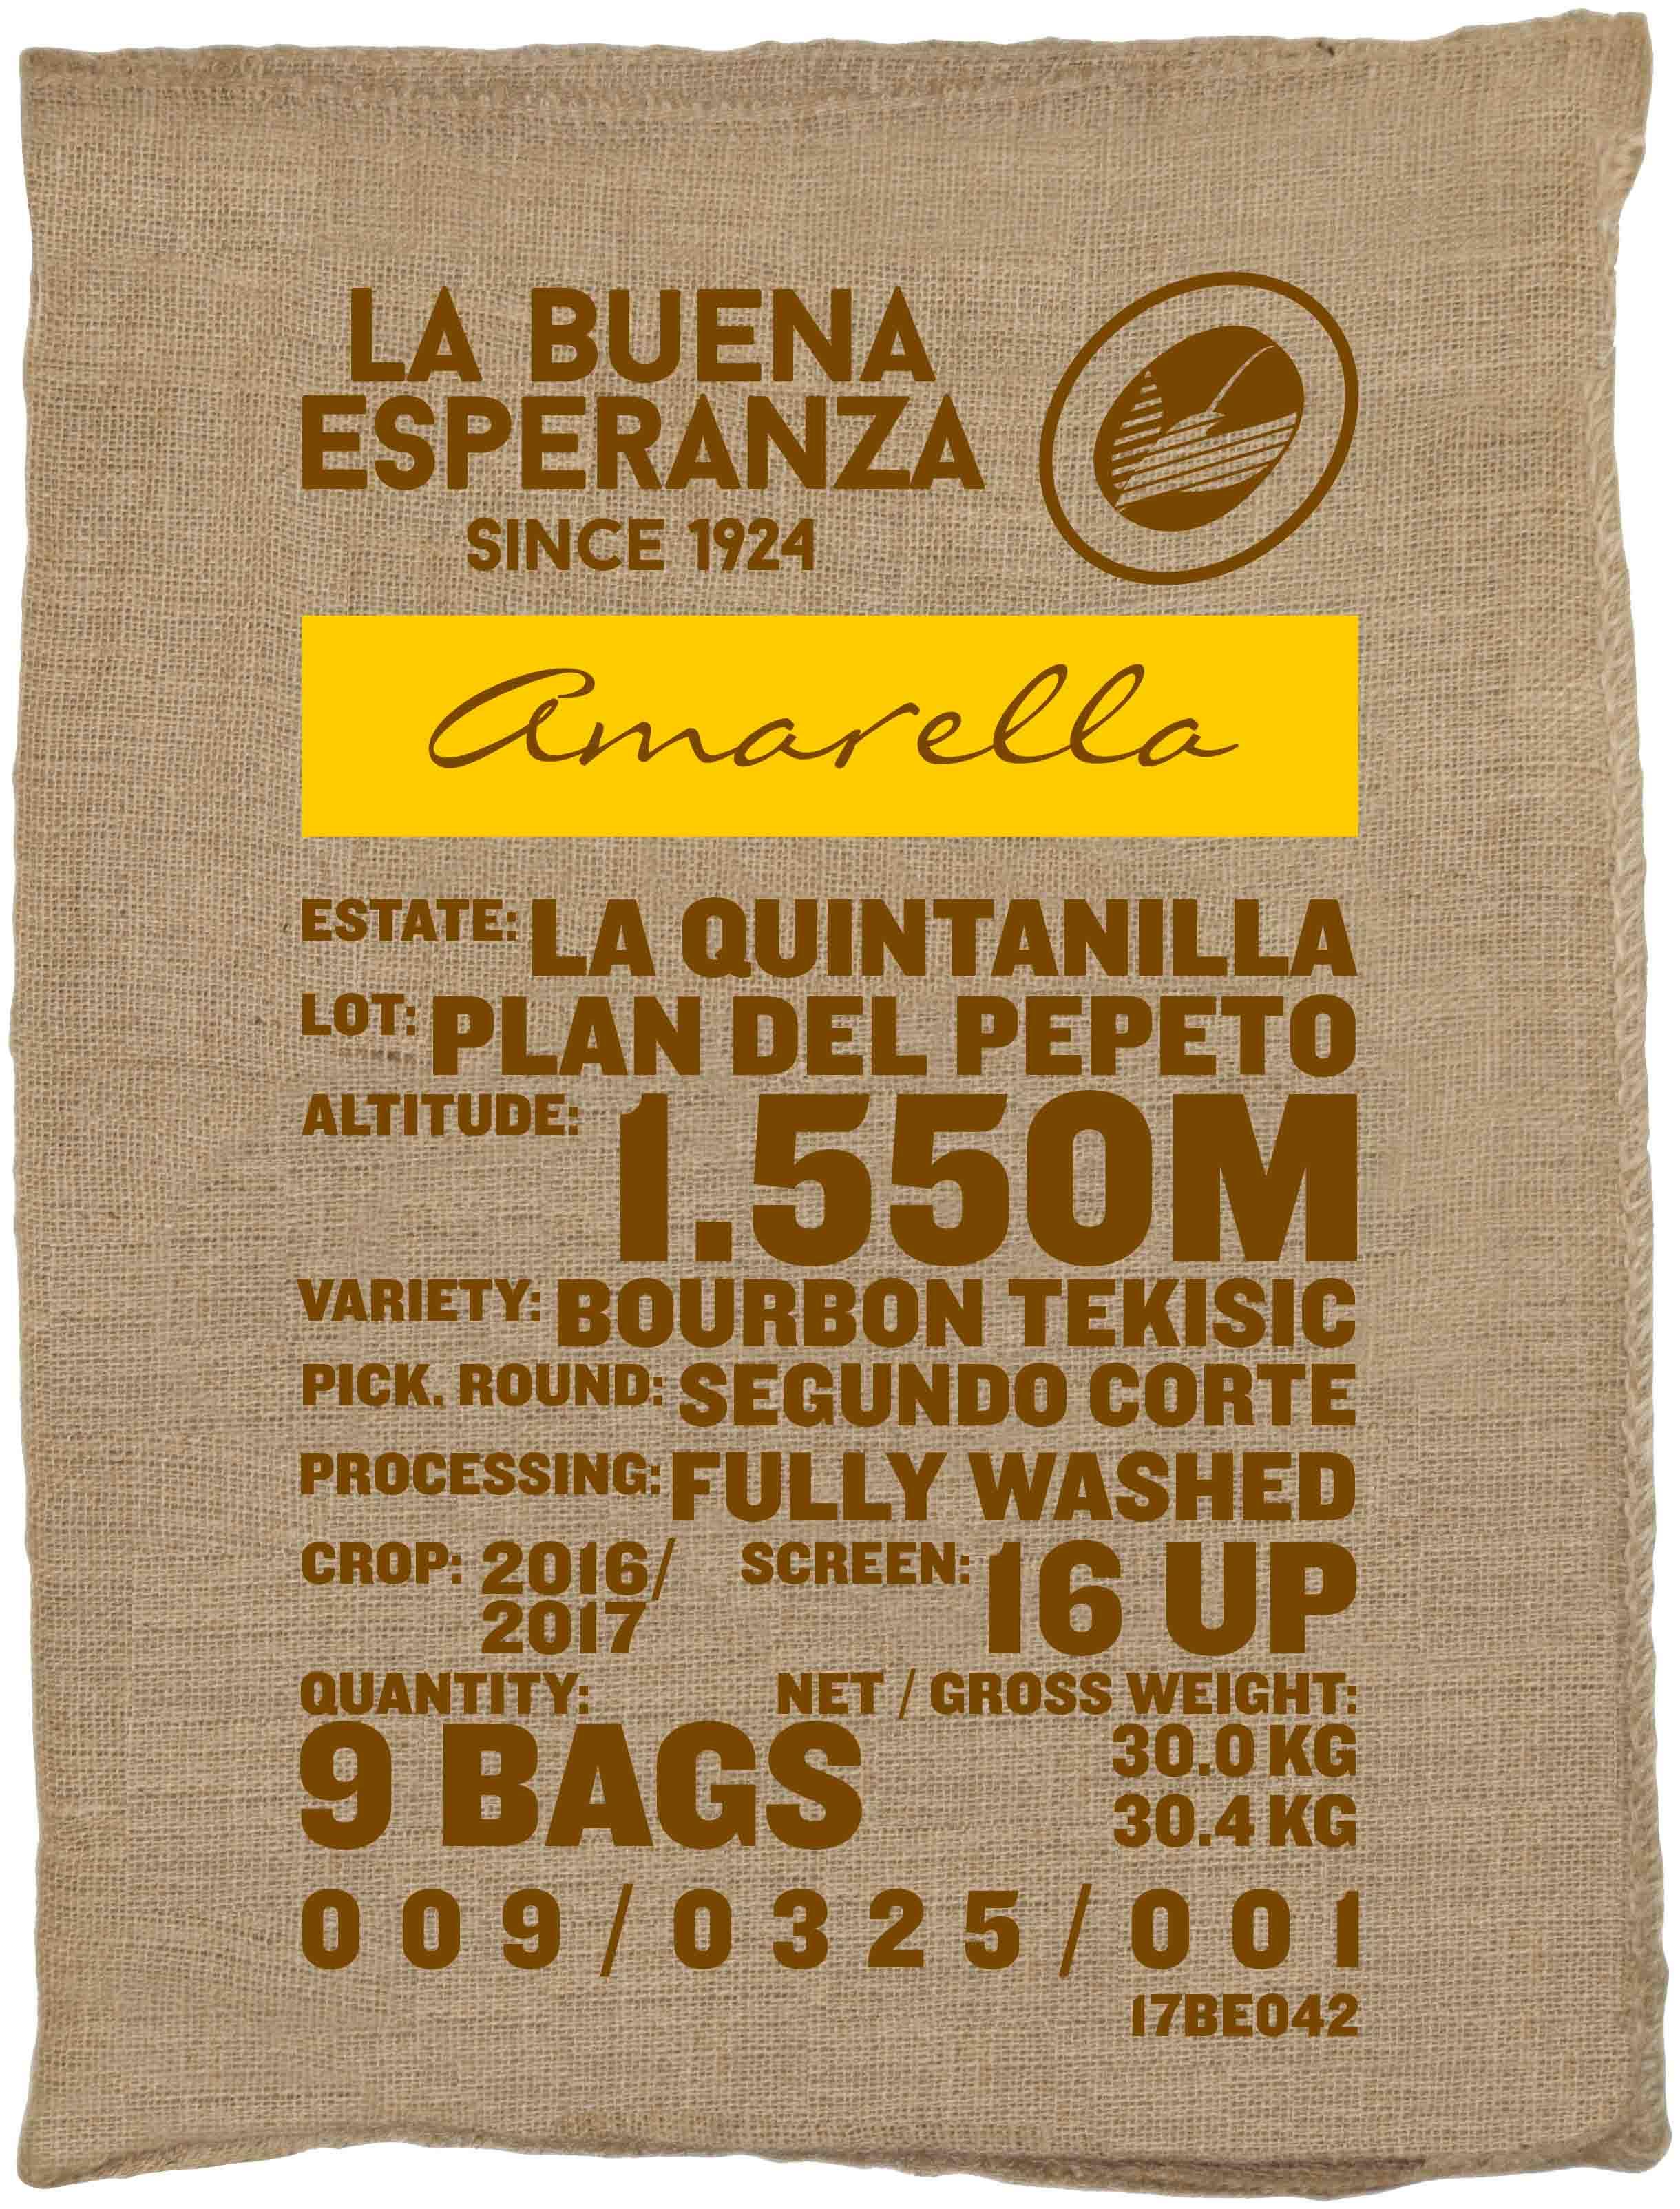 Ein Rohkaffeesack amarella Parzellenkaffee Varietät Bourbon Tekisic. Finca La Buena Esperanza Lot Plan del Pepeto.